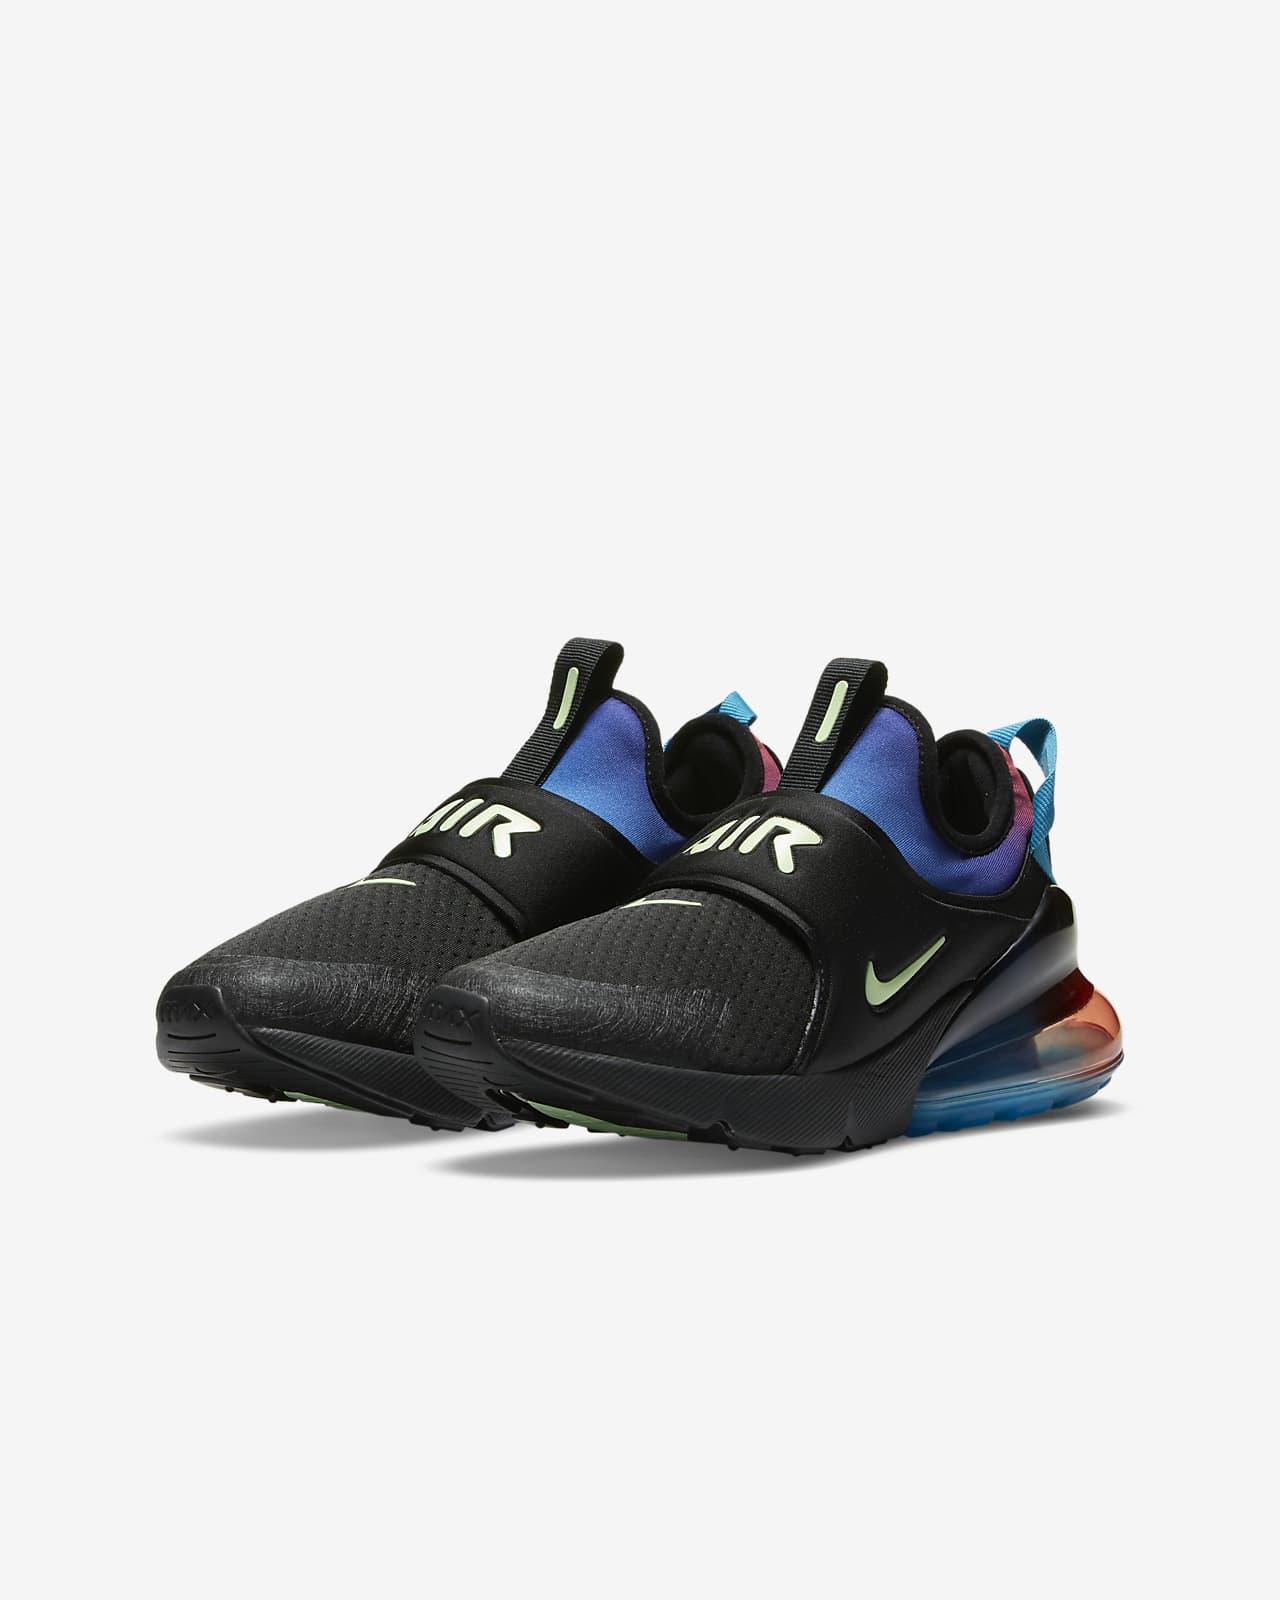 Huelga distancia Saca la aseguranza  Nike Air Max 270 Extreme SE Big Kids' Shoe. Nike.com